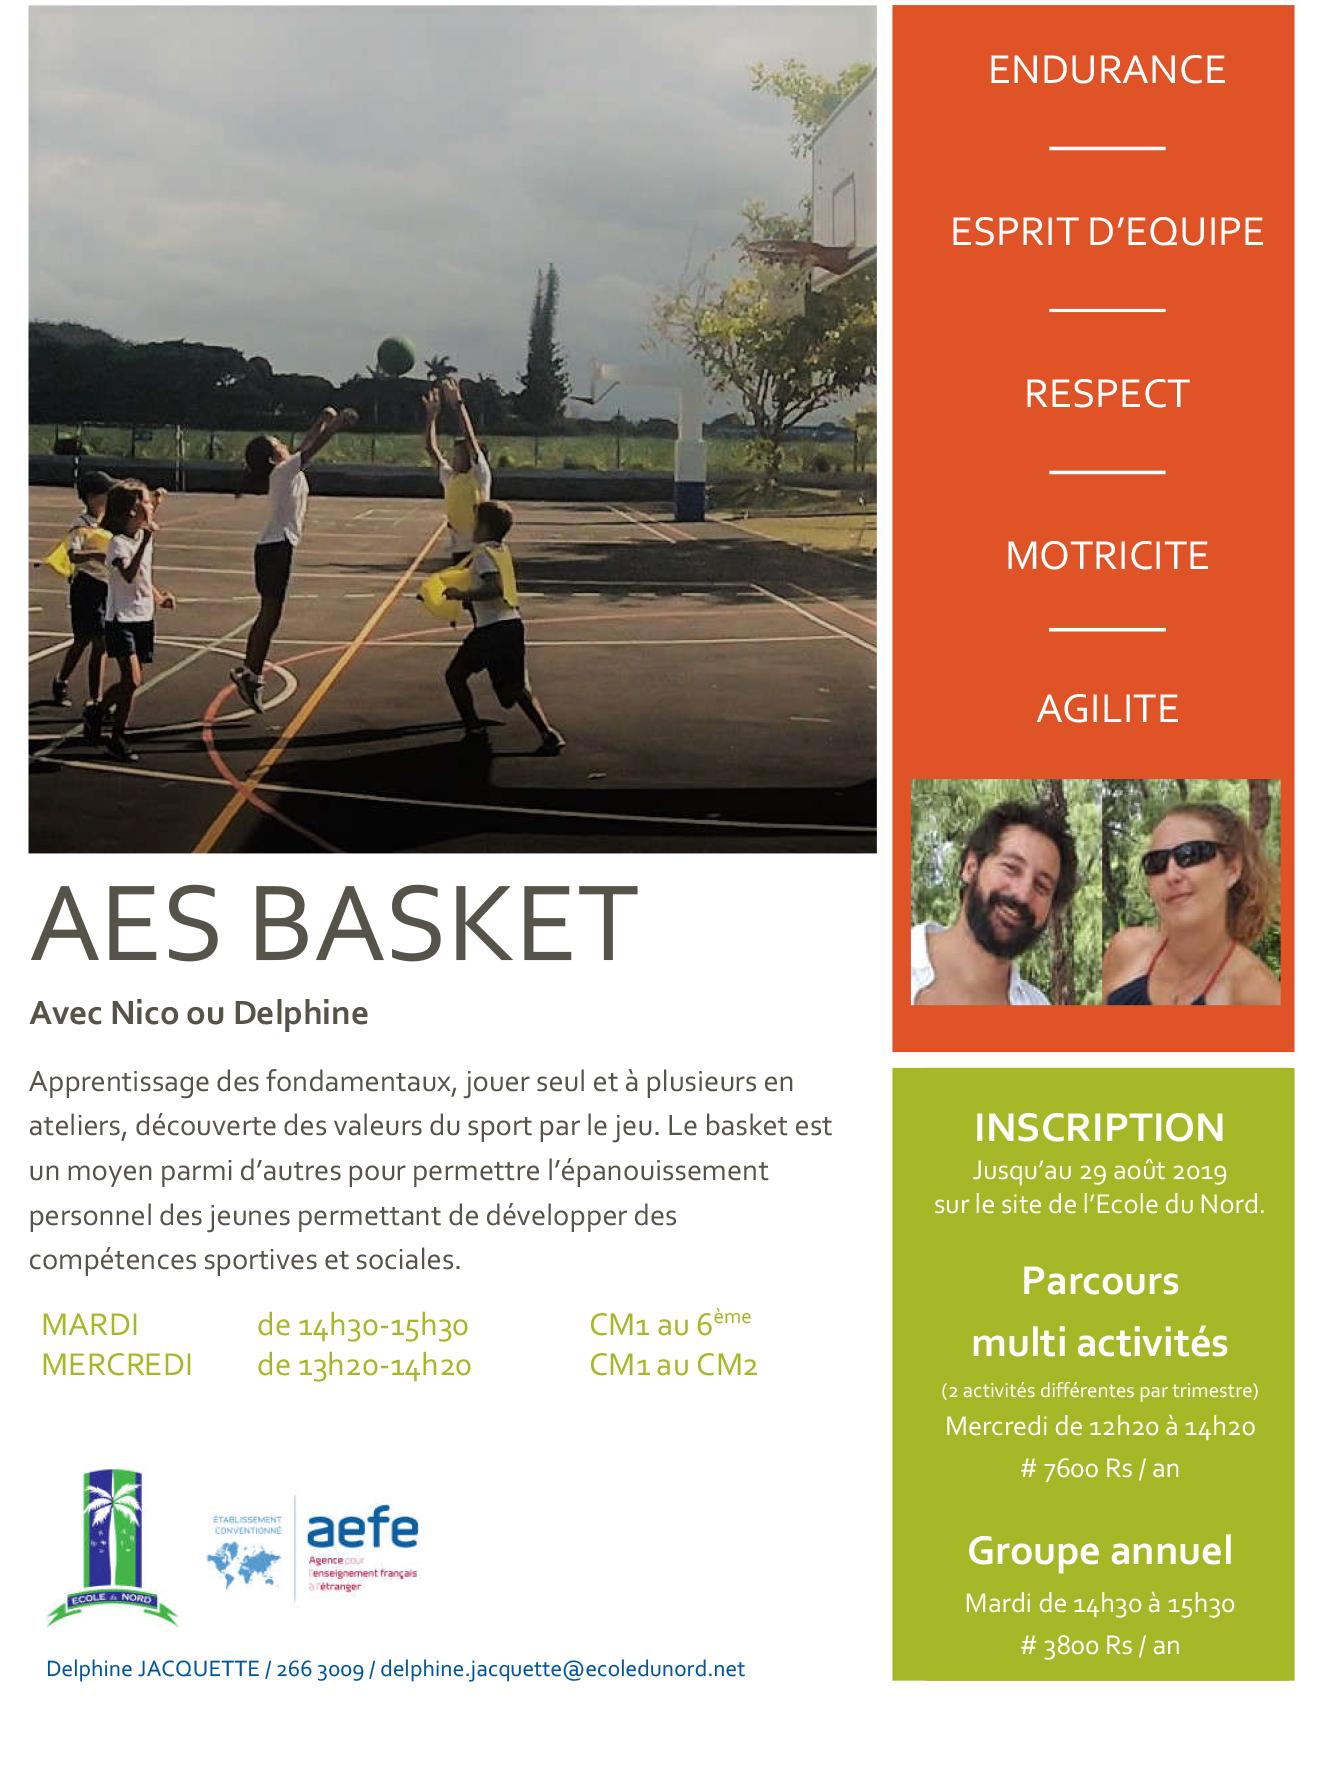 AES 2019-2020 fiches-16 copie